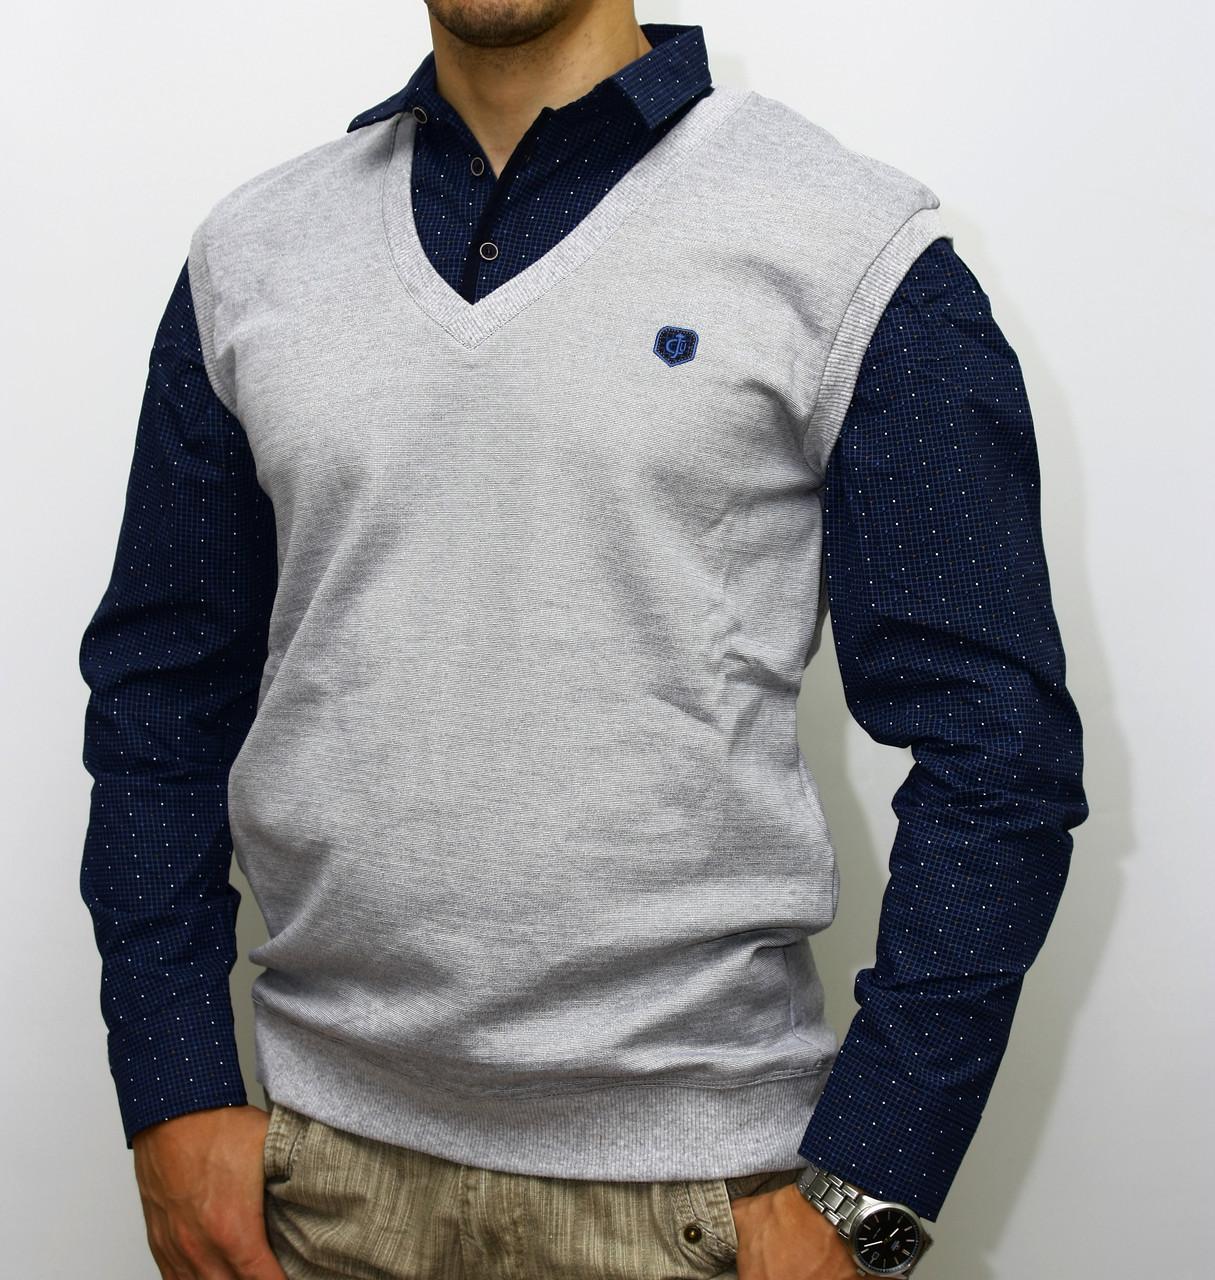 Турецкая мужская кофта-обманка